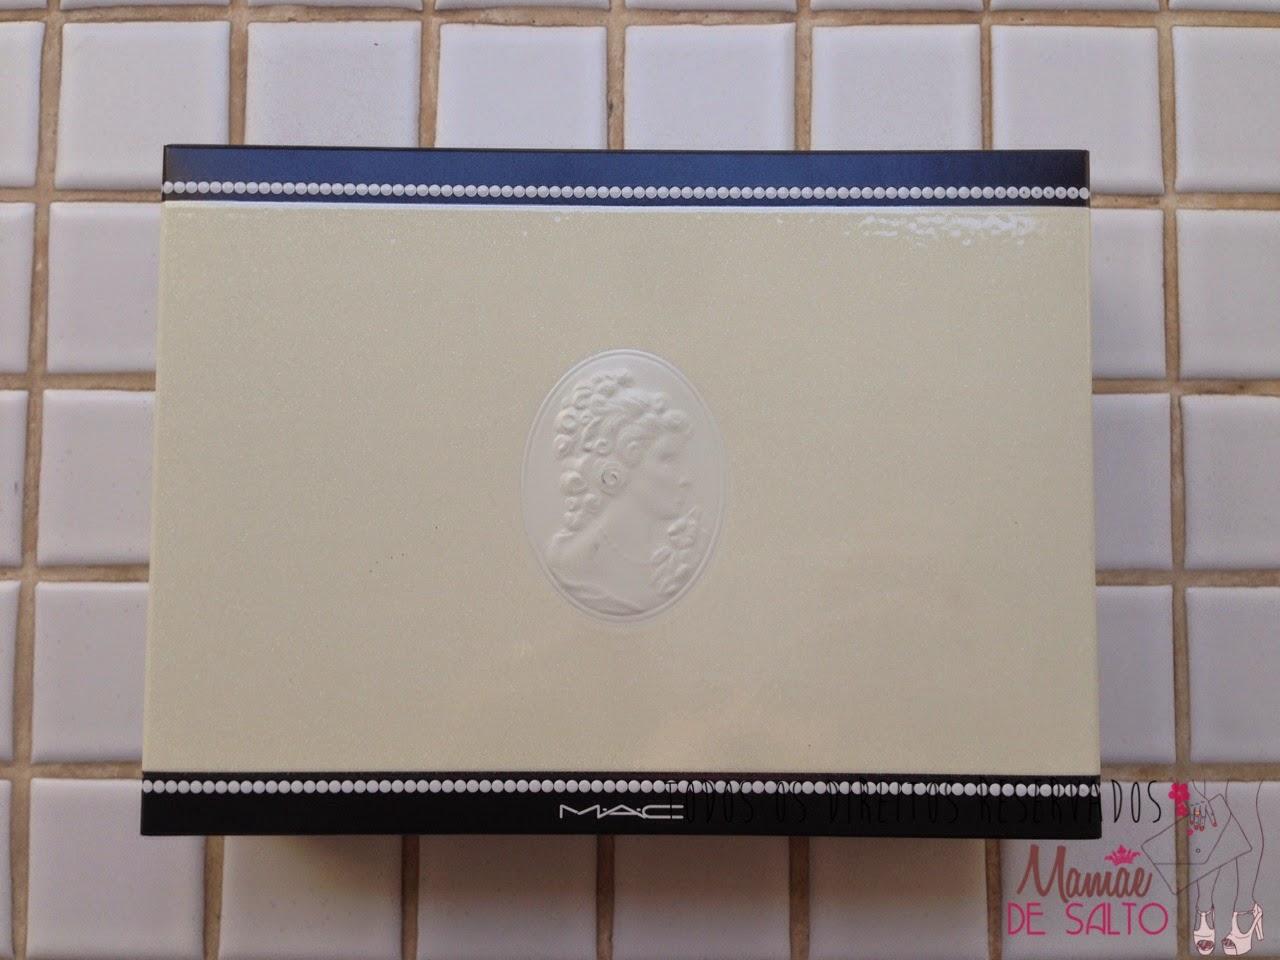 Coleção MAC Heirloom Mix keepsakes eye bag